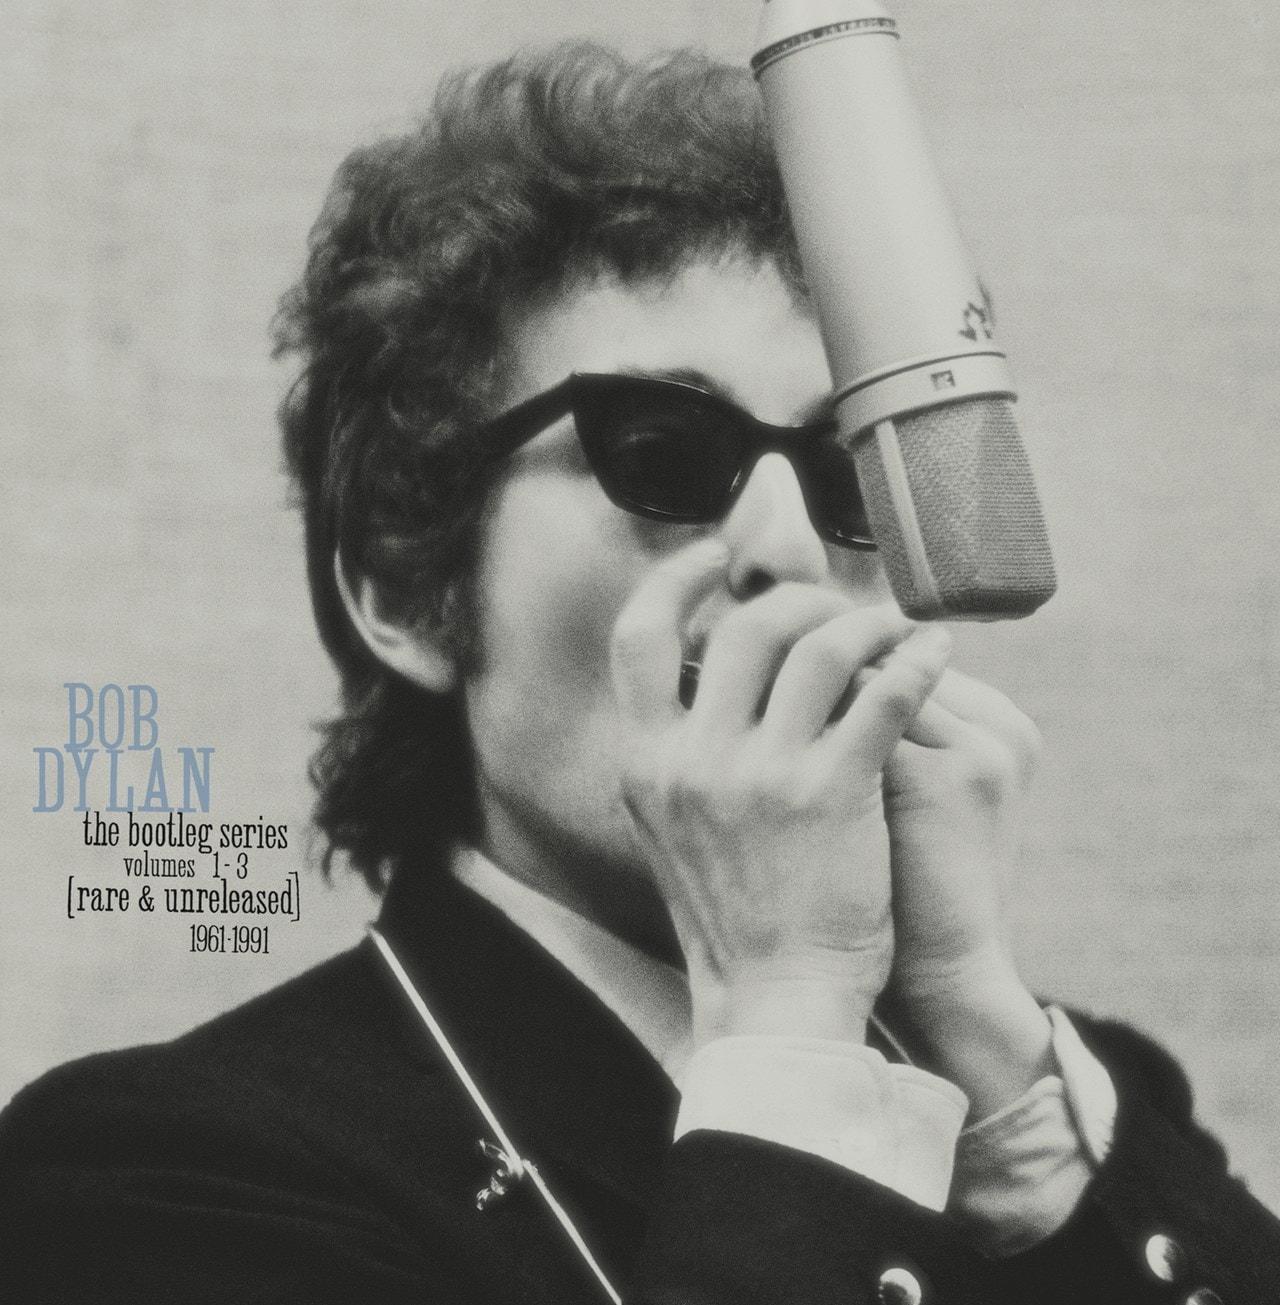 The Bootleg Series: Rare & Unreleased 1961-1991 - Volume 1-3 - 1